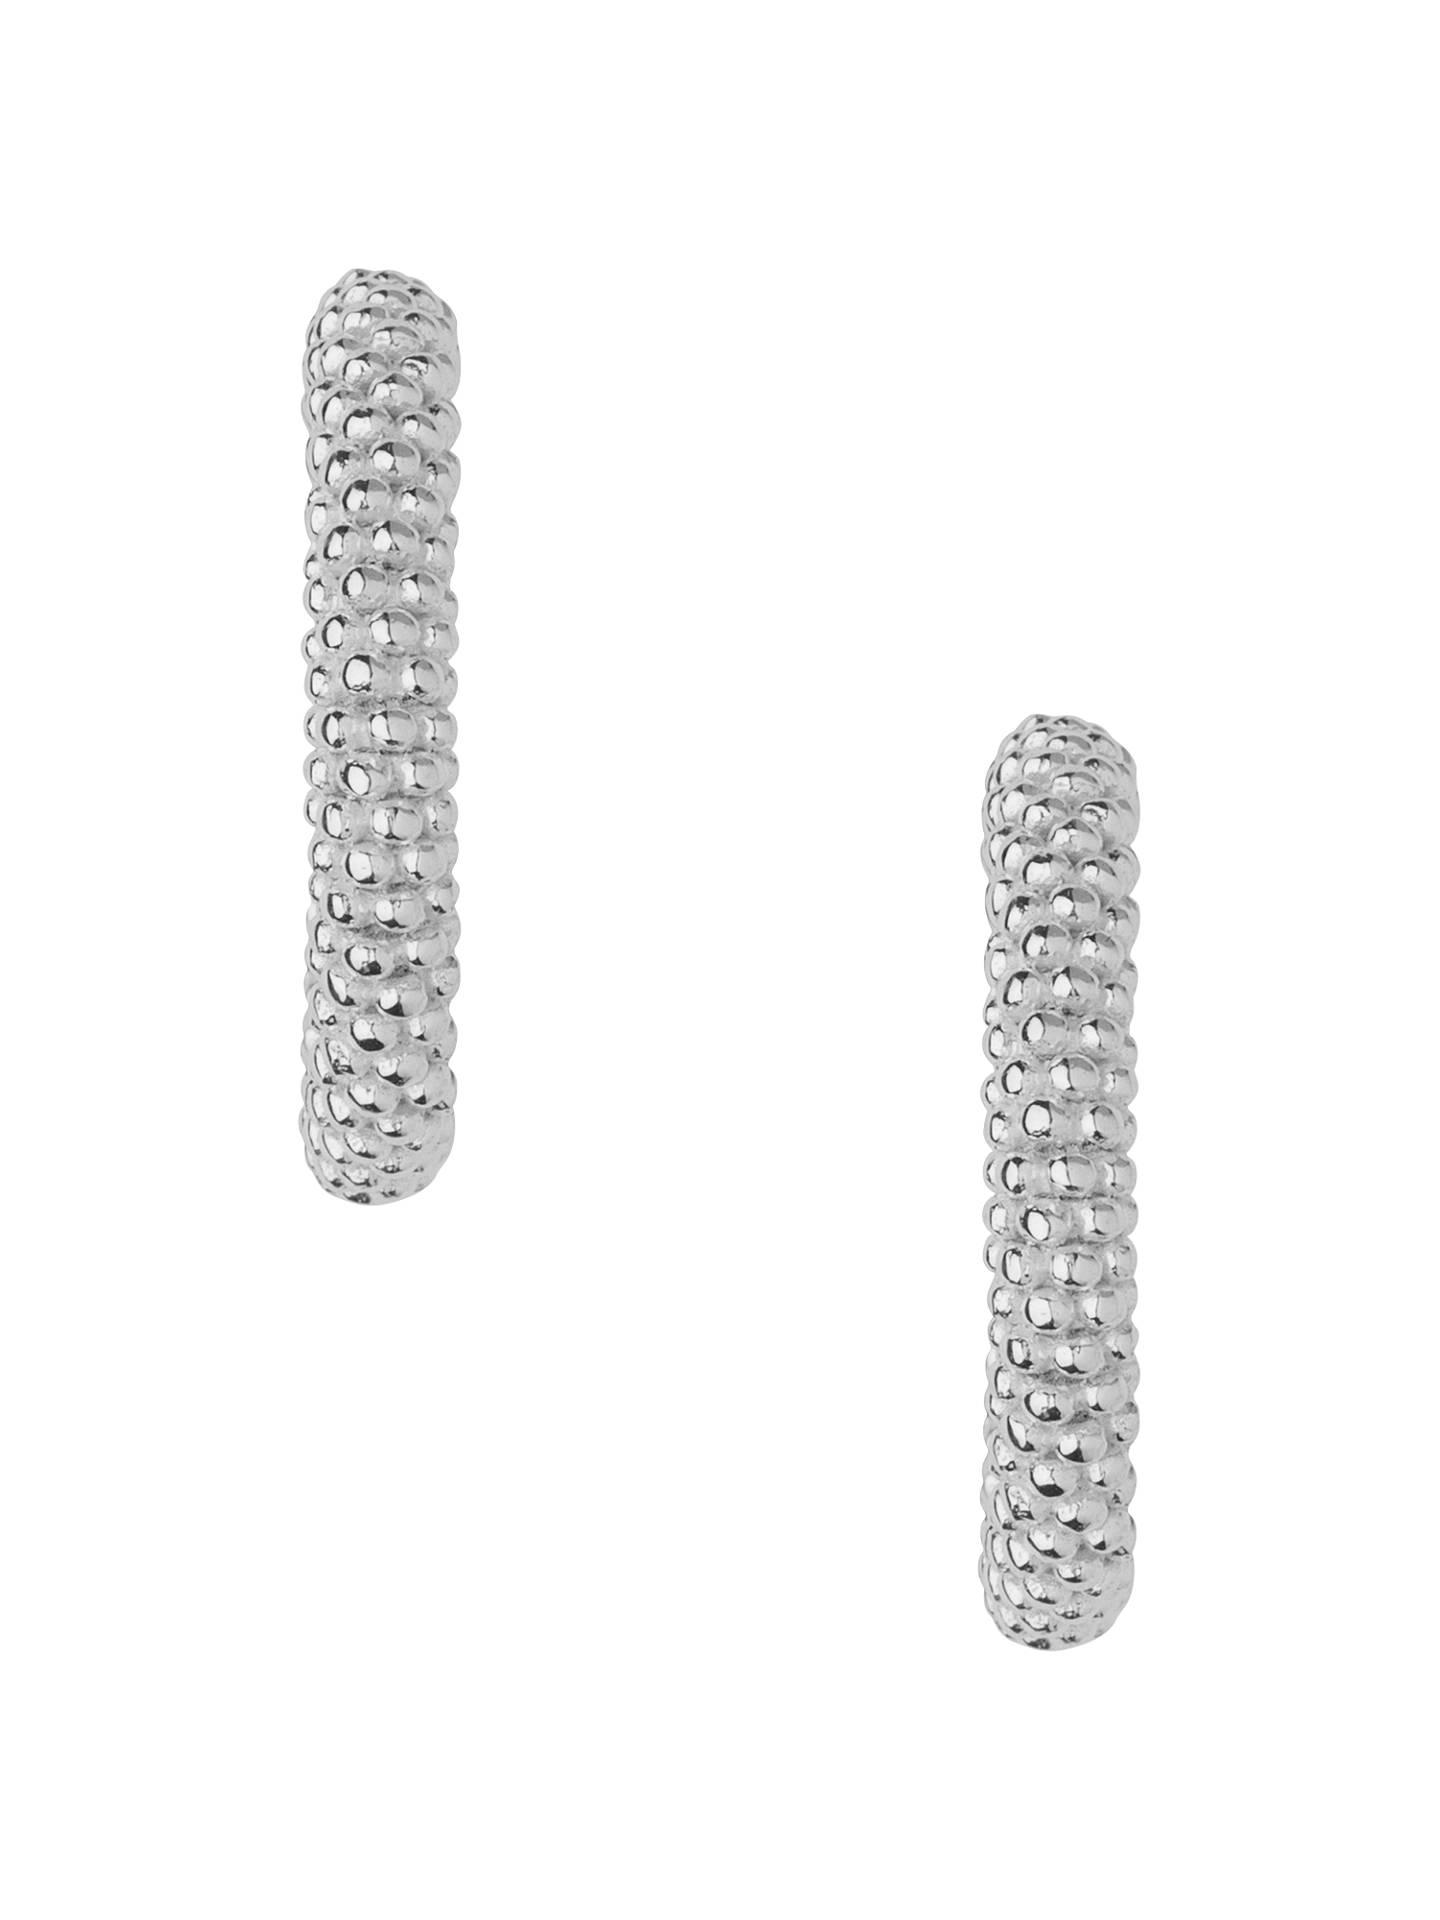 ebe3830113df5e Buy Links of London Effervescence XS Sterling Silver Hoop Earrings Online  at johnlewis.com ...